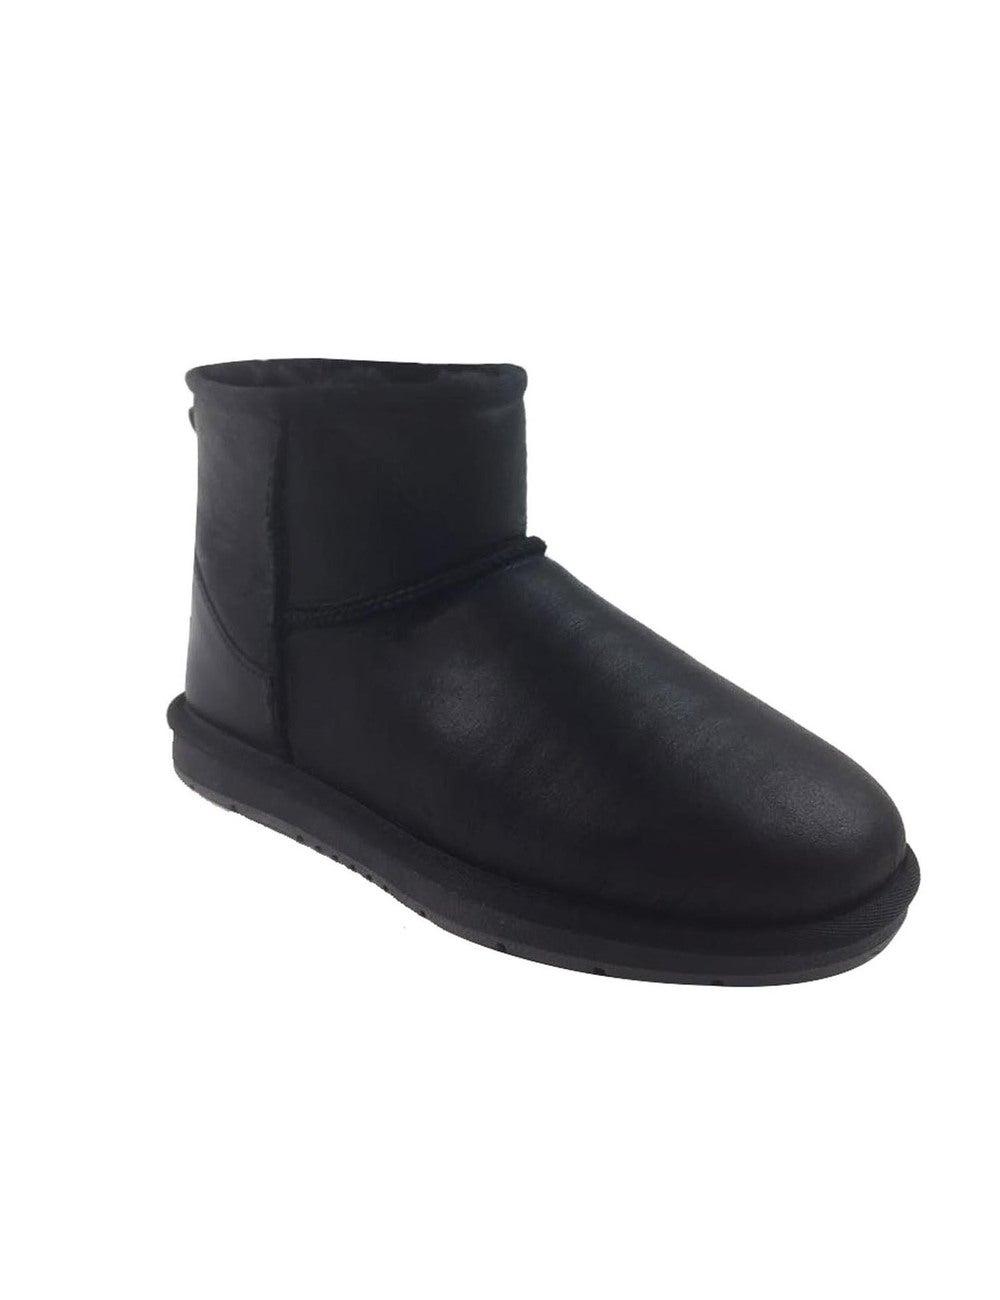 Ugg Boots, Scarves \u0026 More   Rivers